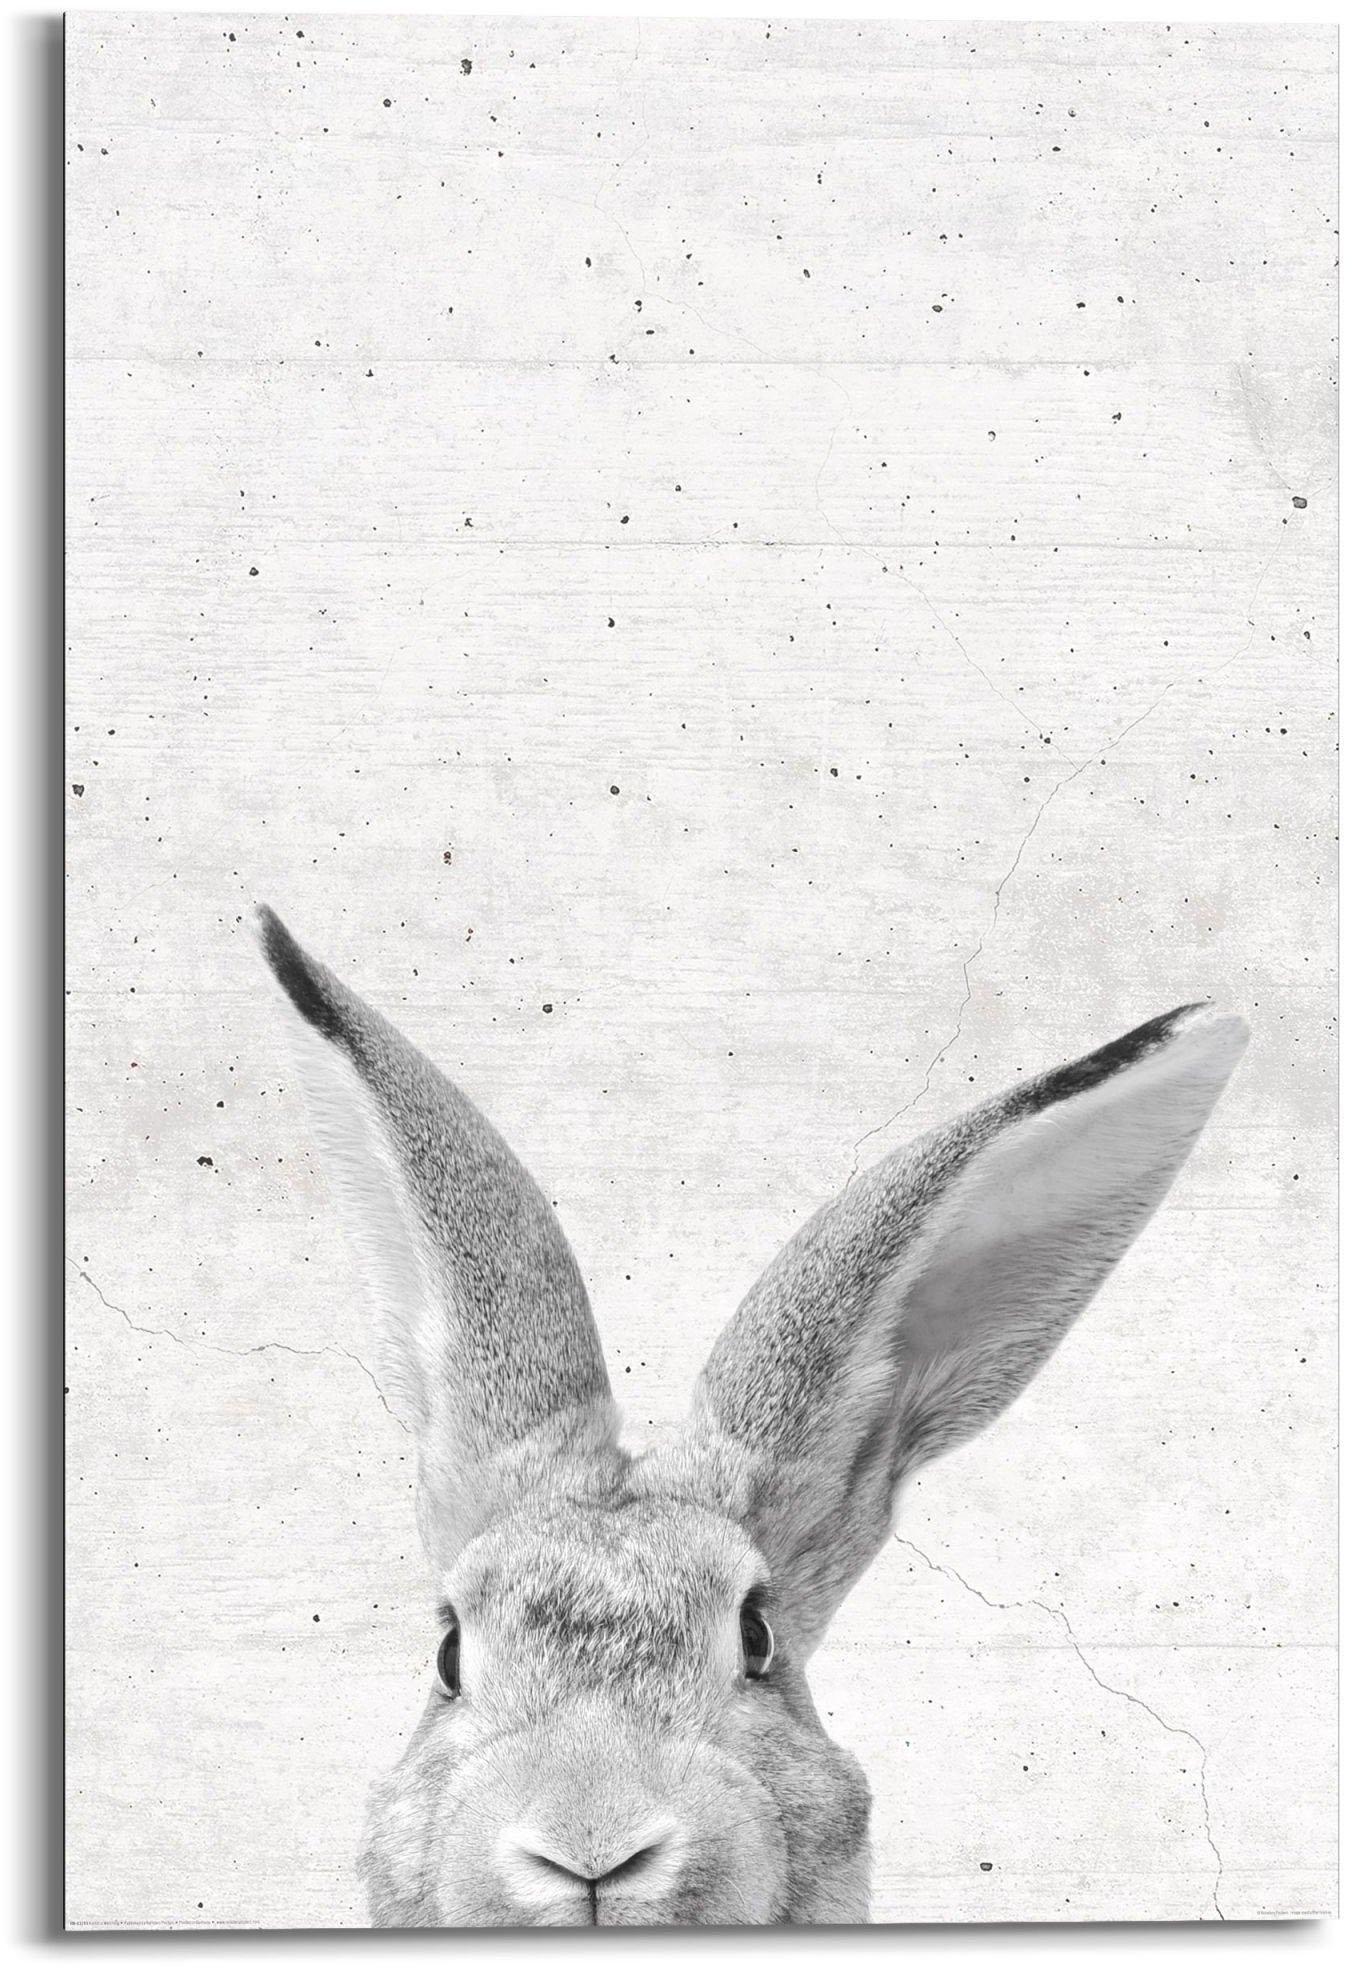 Reinders! artprint Wandbild Kaninchen beobachtet dich Tiermotiv - Hase - Niedlich (1 stuk) nu online bestellen